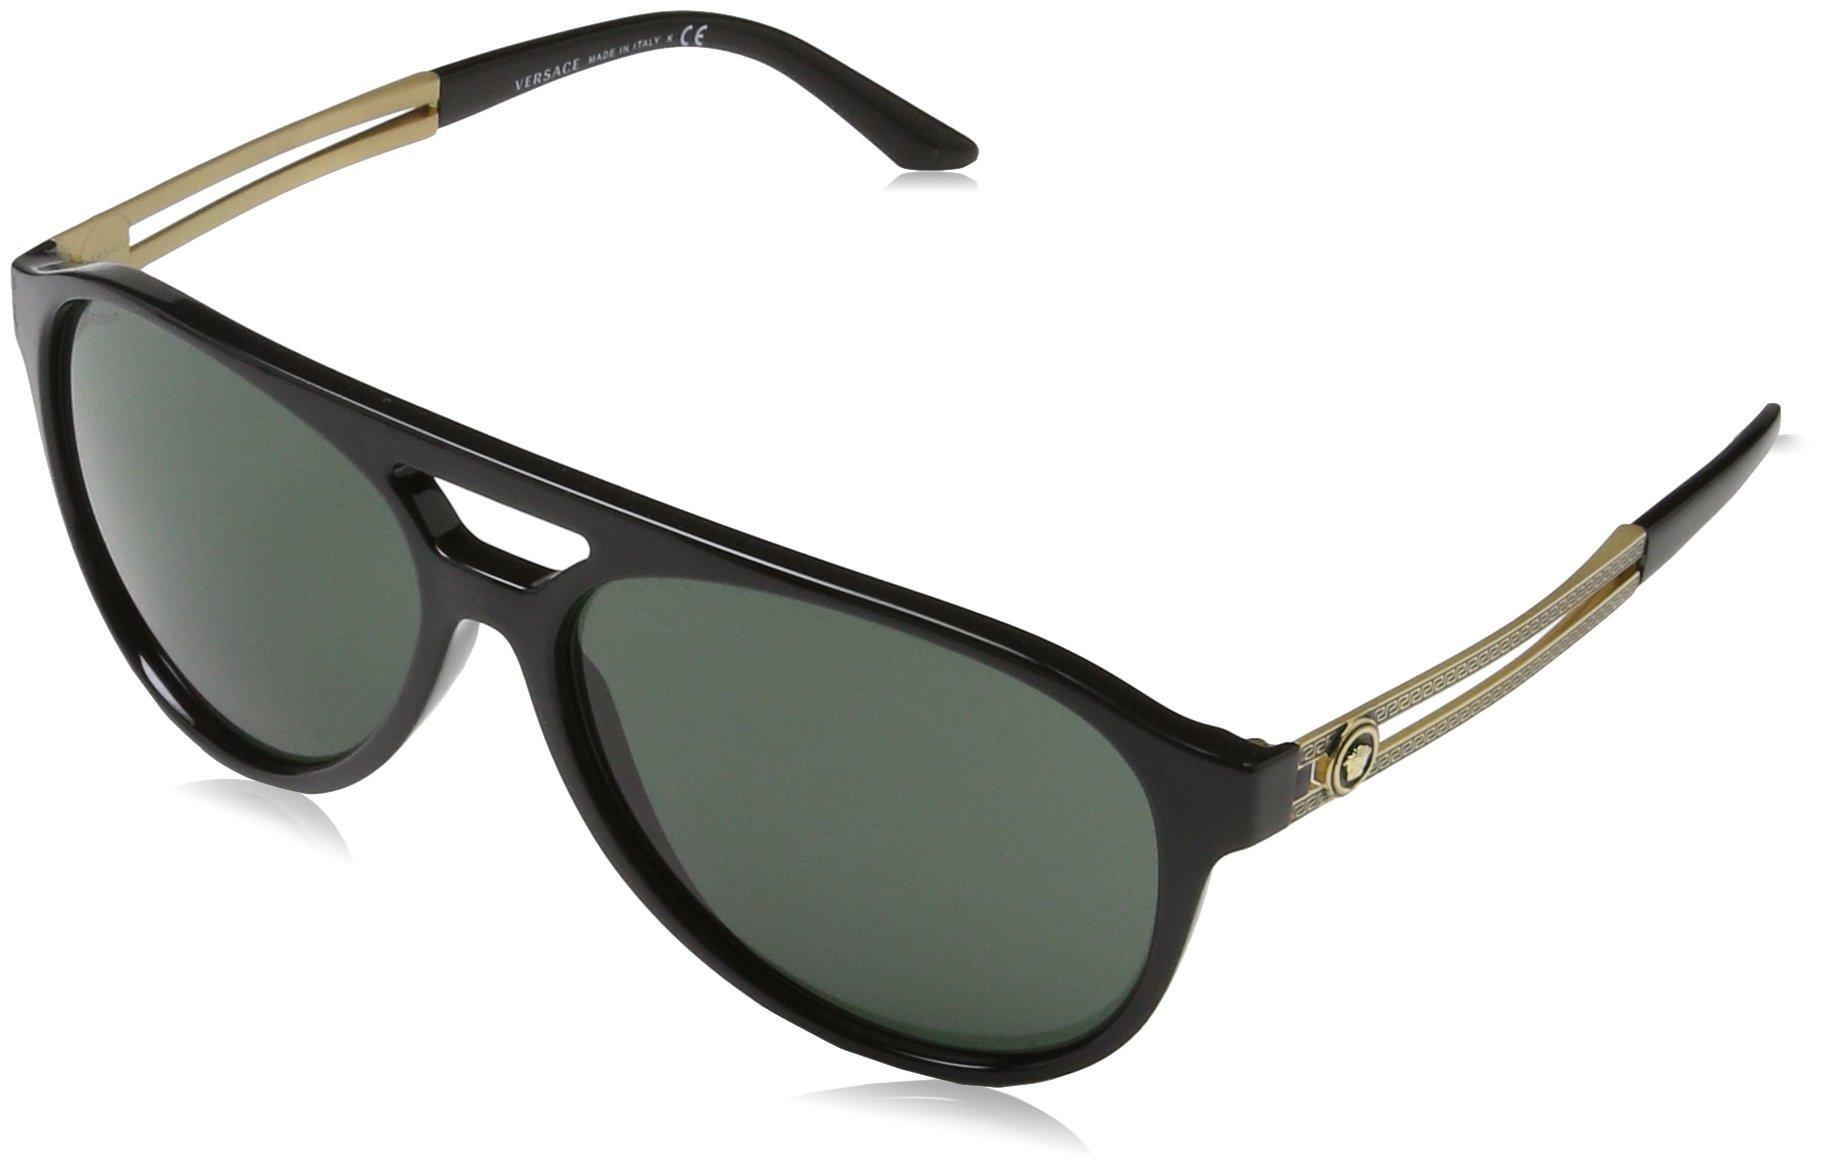 Versace Mens Sunglasses (VE4312) Black/Grey Plastic,Nylon - Non-Polarized - 60mm